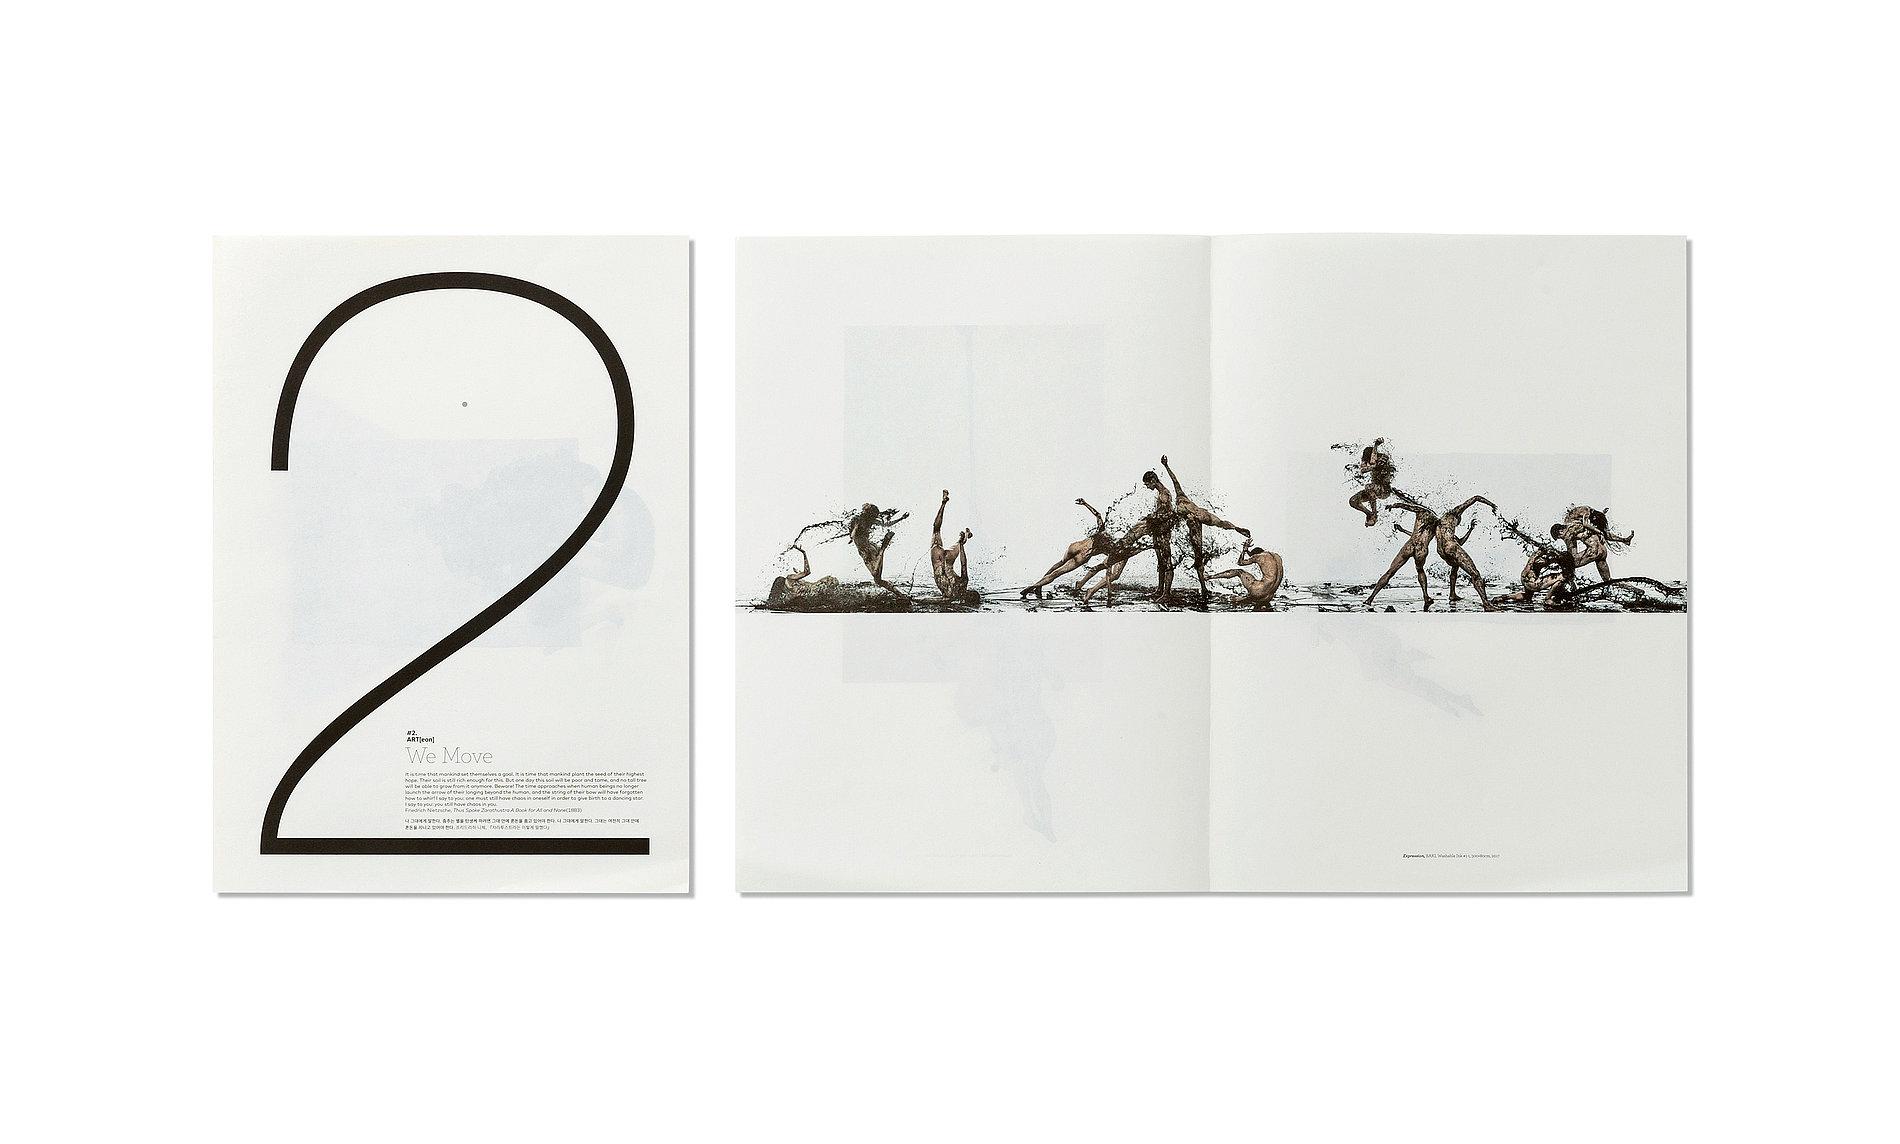 Arteon | Red Dot Design Award